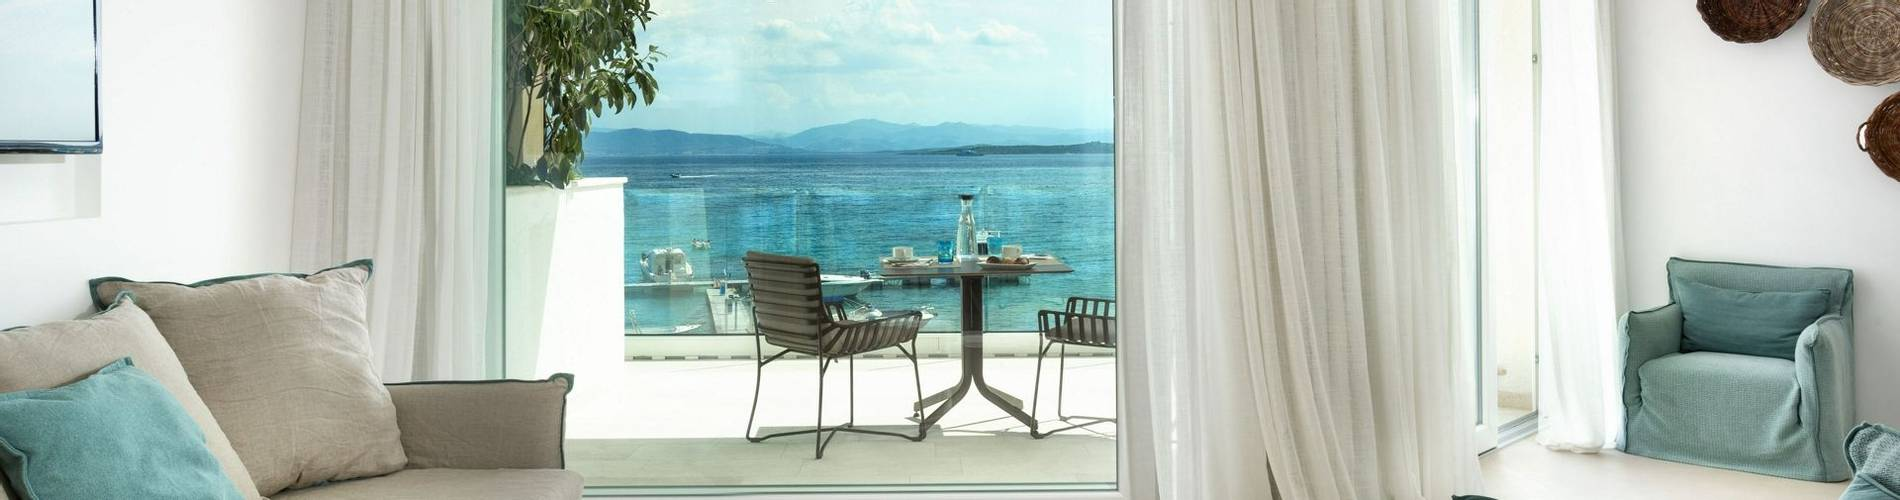 Pool Suite - Gabbiano Azzurro Hotel Sardinia9.jpg